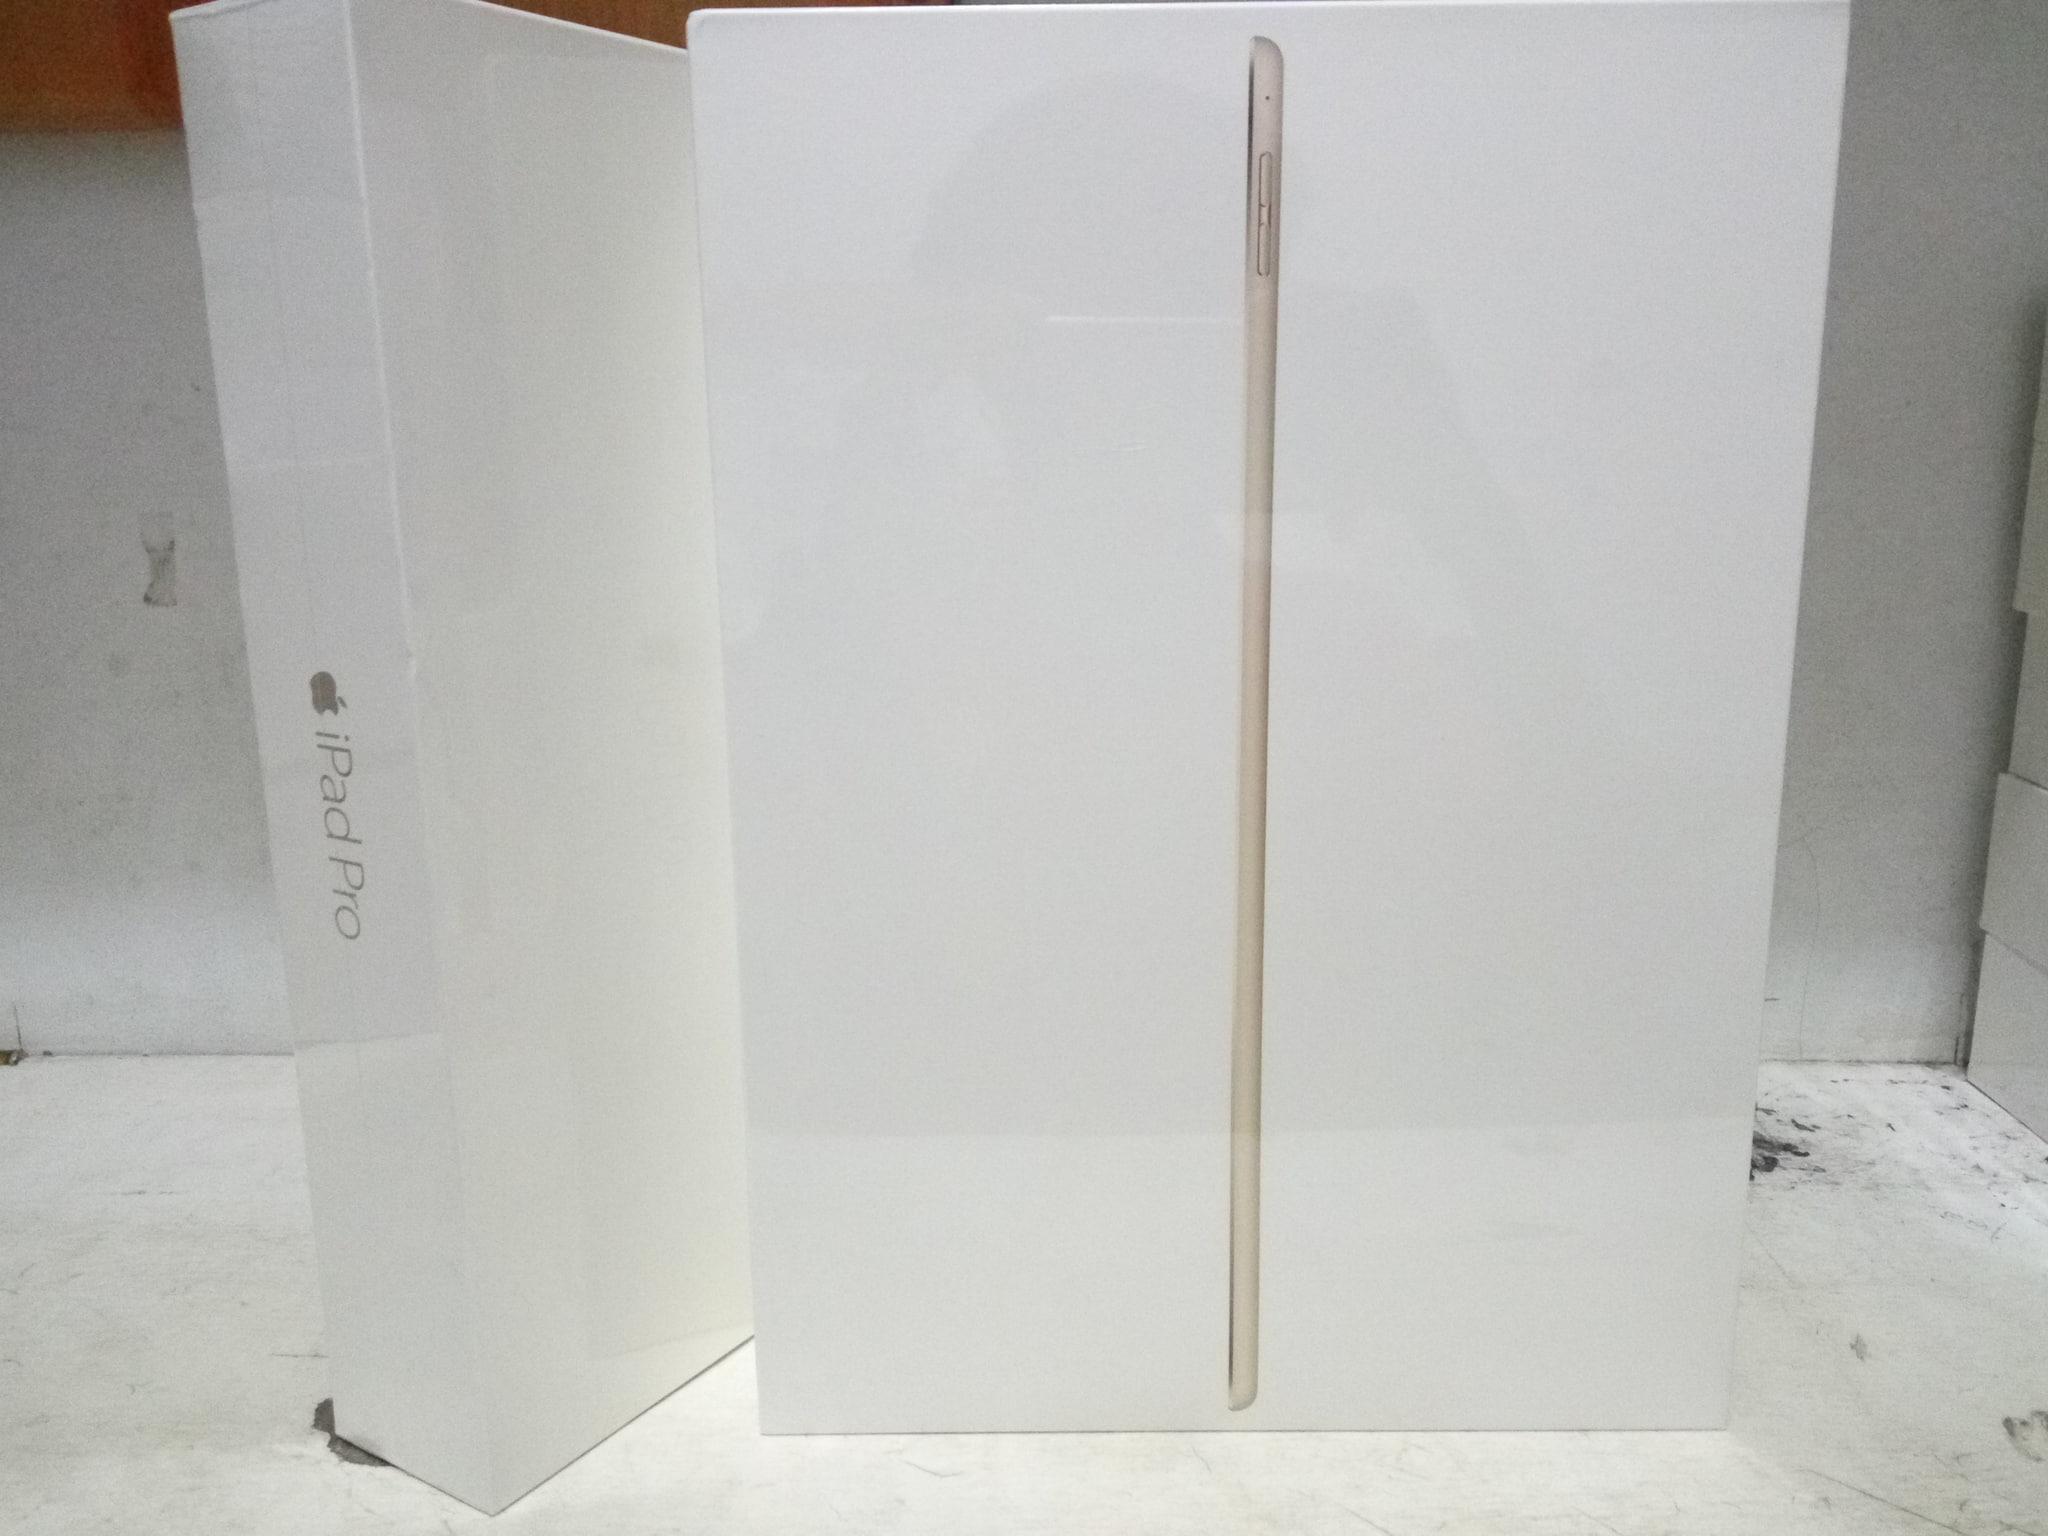 Harga Jual New Ipad Pro 2017 129 Wifi Only 512gb Garansi Apple 1 Mini Cellular 256gb Tahun Best Inch Warranty